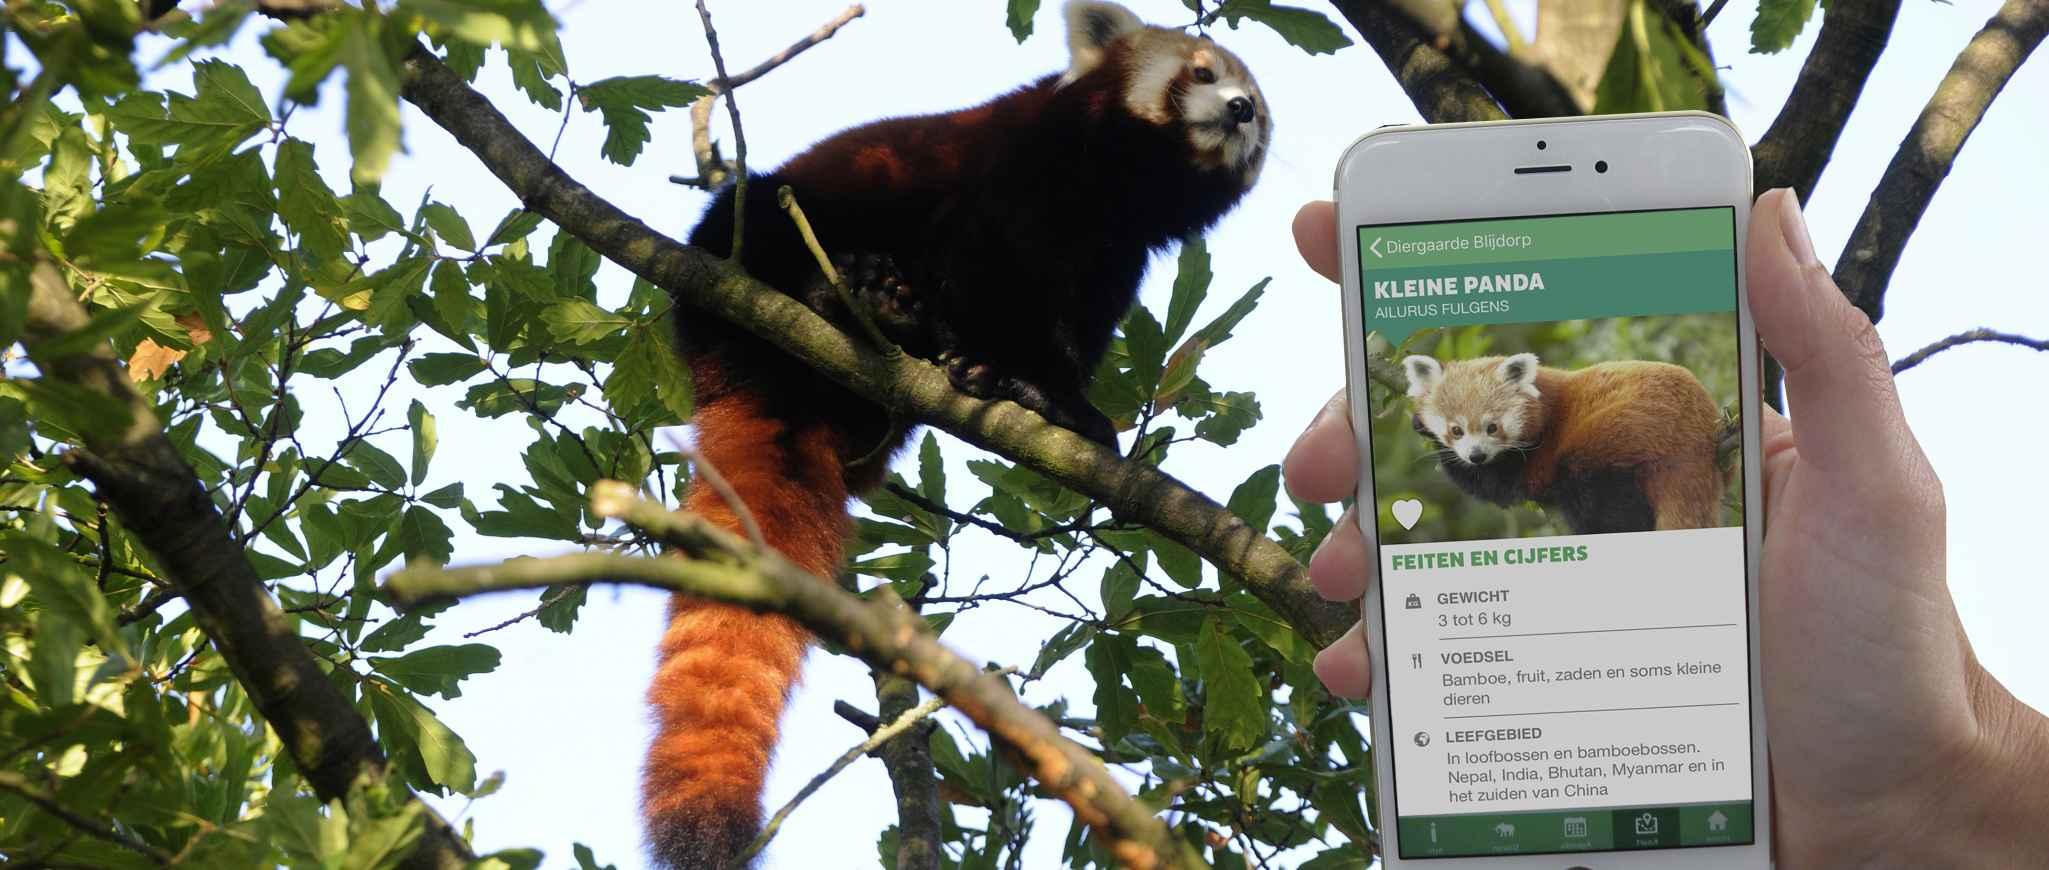 startbeeld app panda home